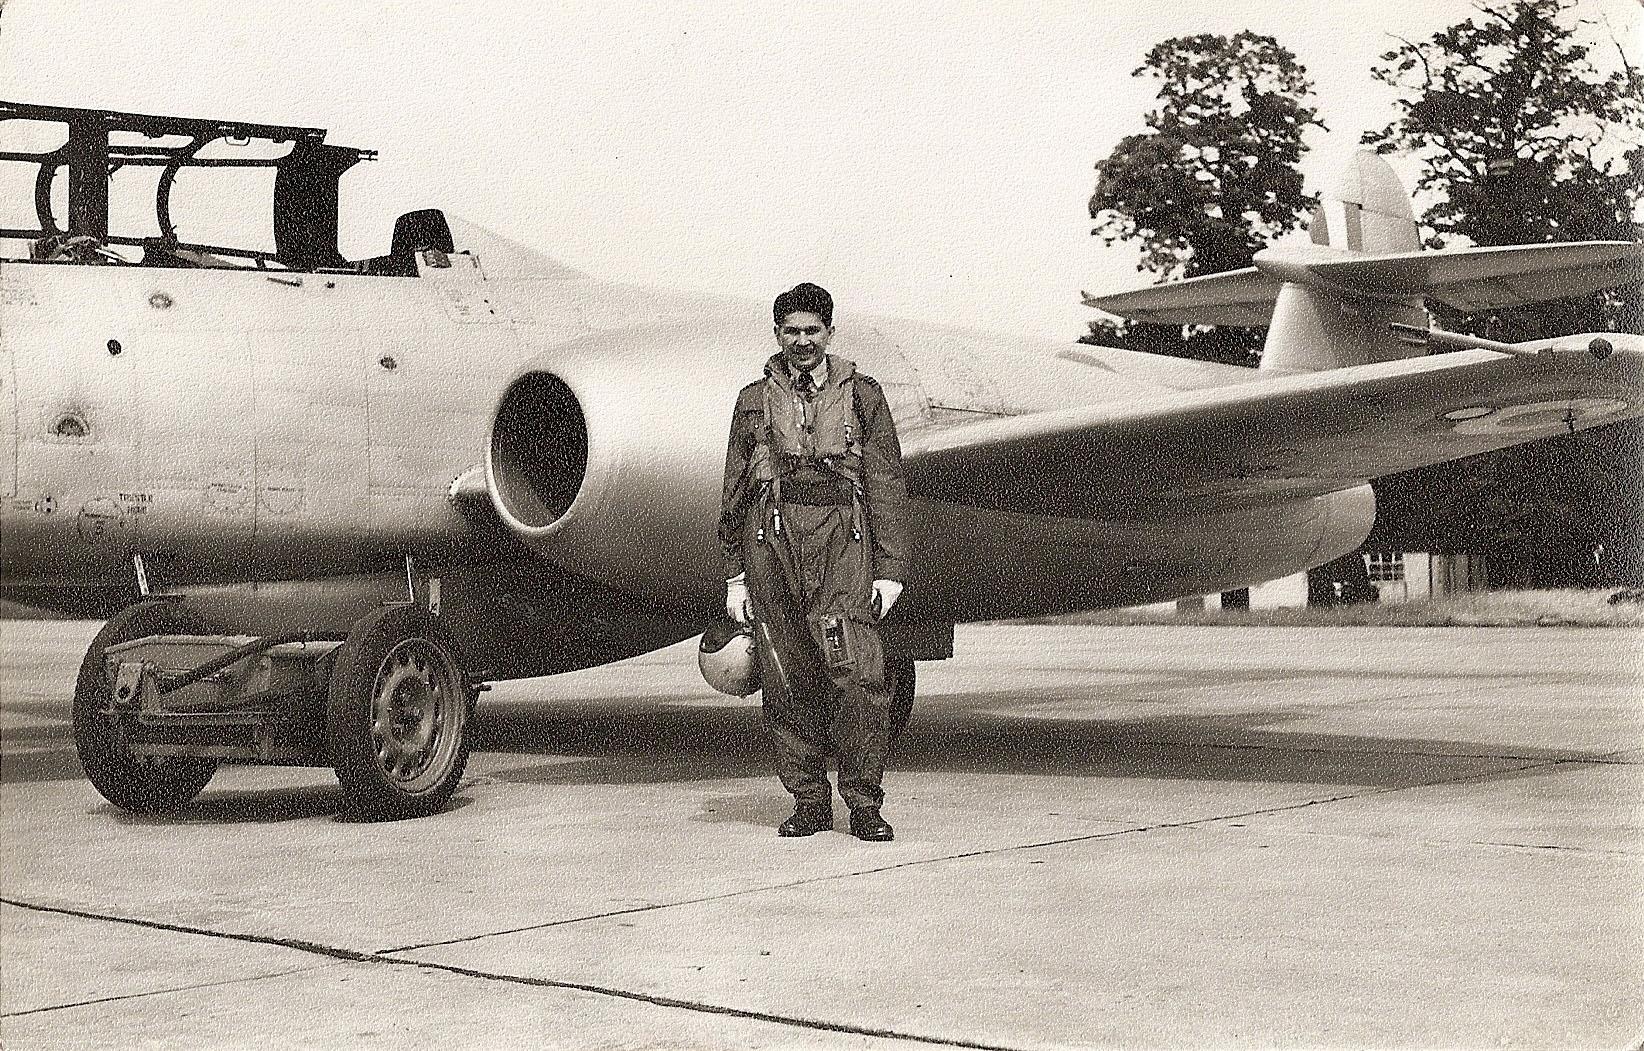 Wing Commander Farquharson, Ferdi, 4 FTS, RAF Worksop